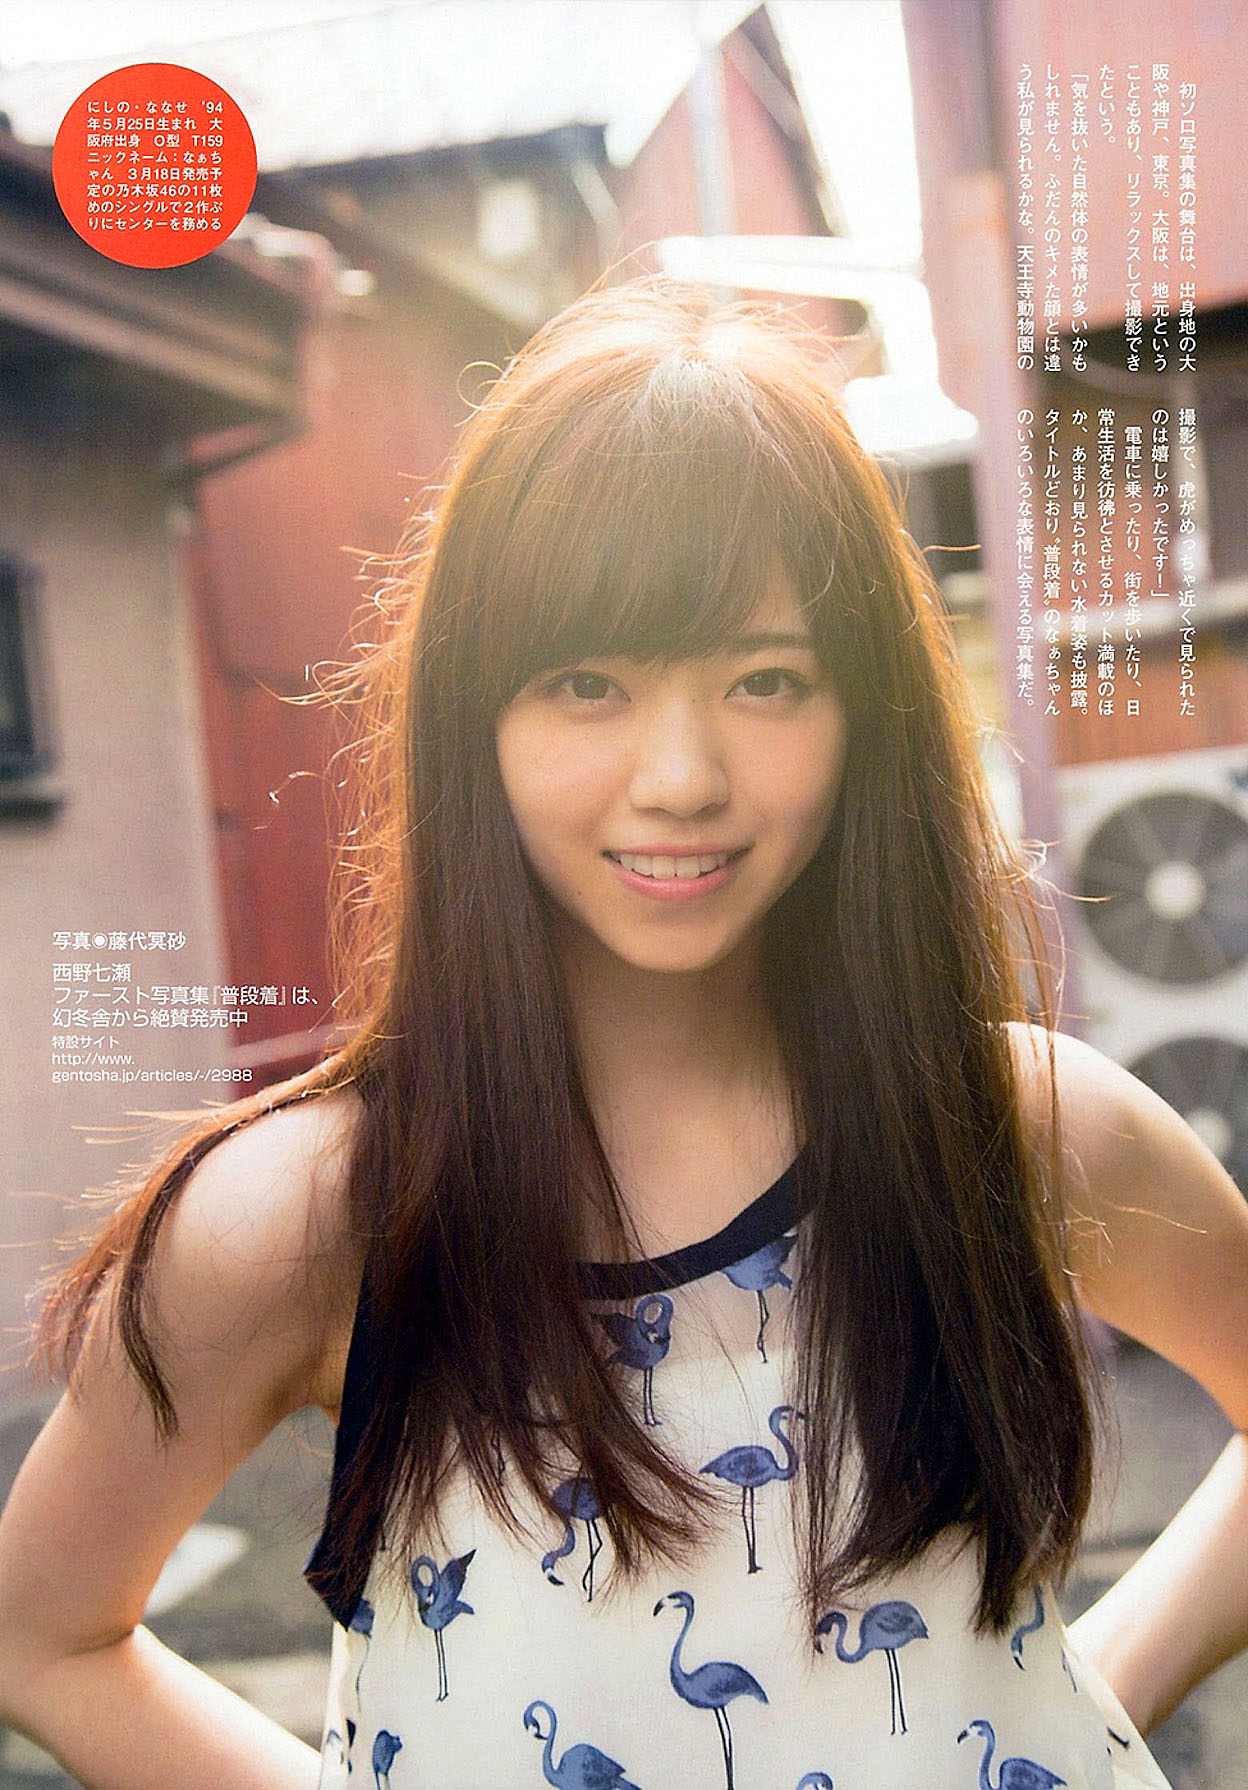 NNishino Flash Gr Sp Best Early Spring 2015 03.jpg